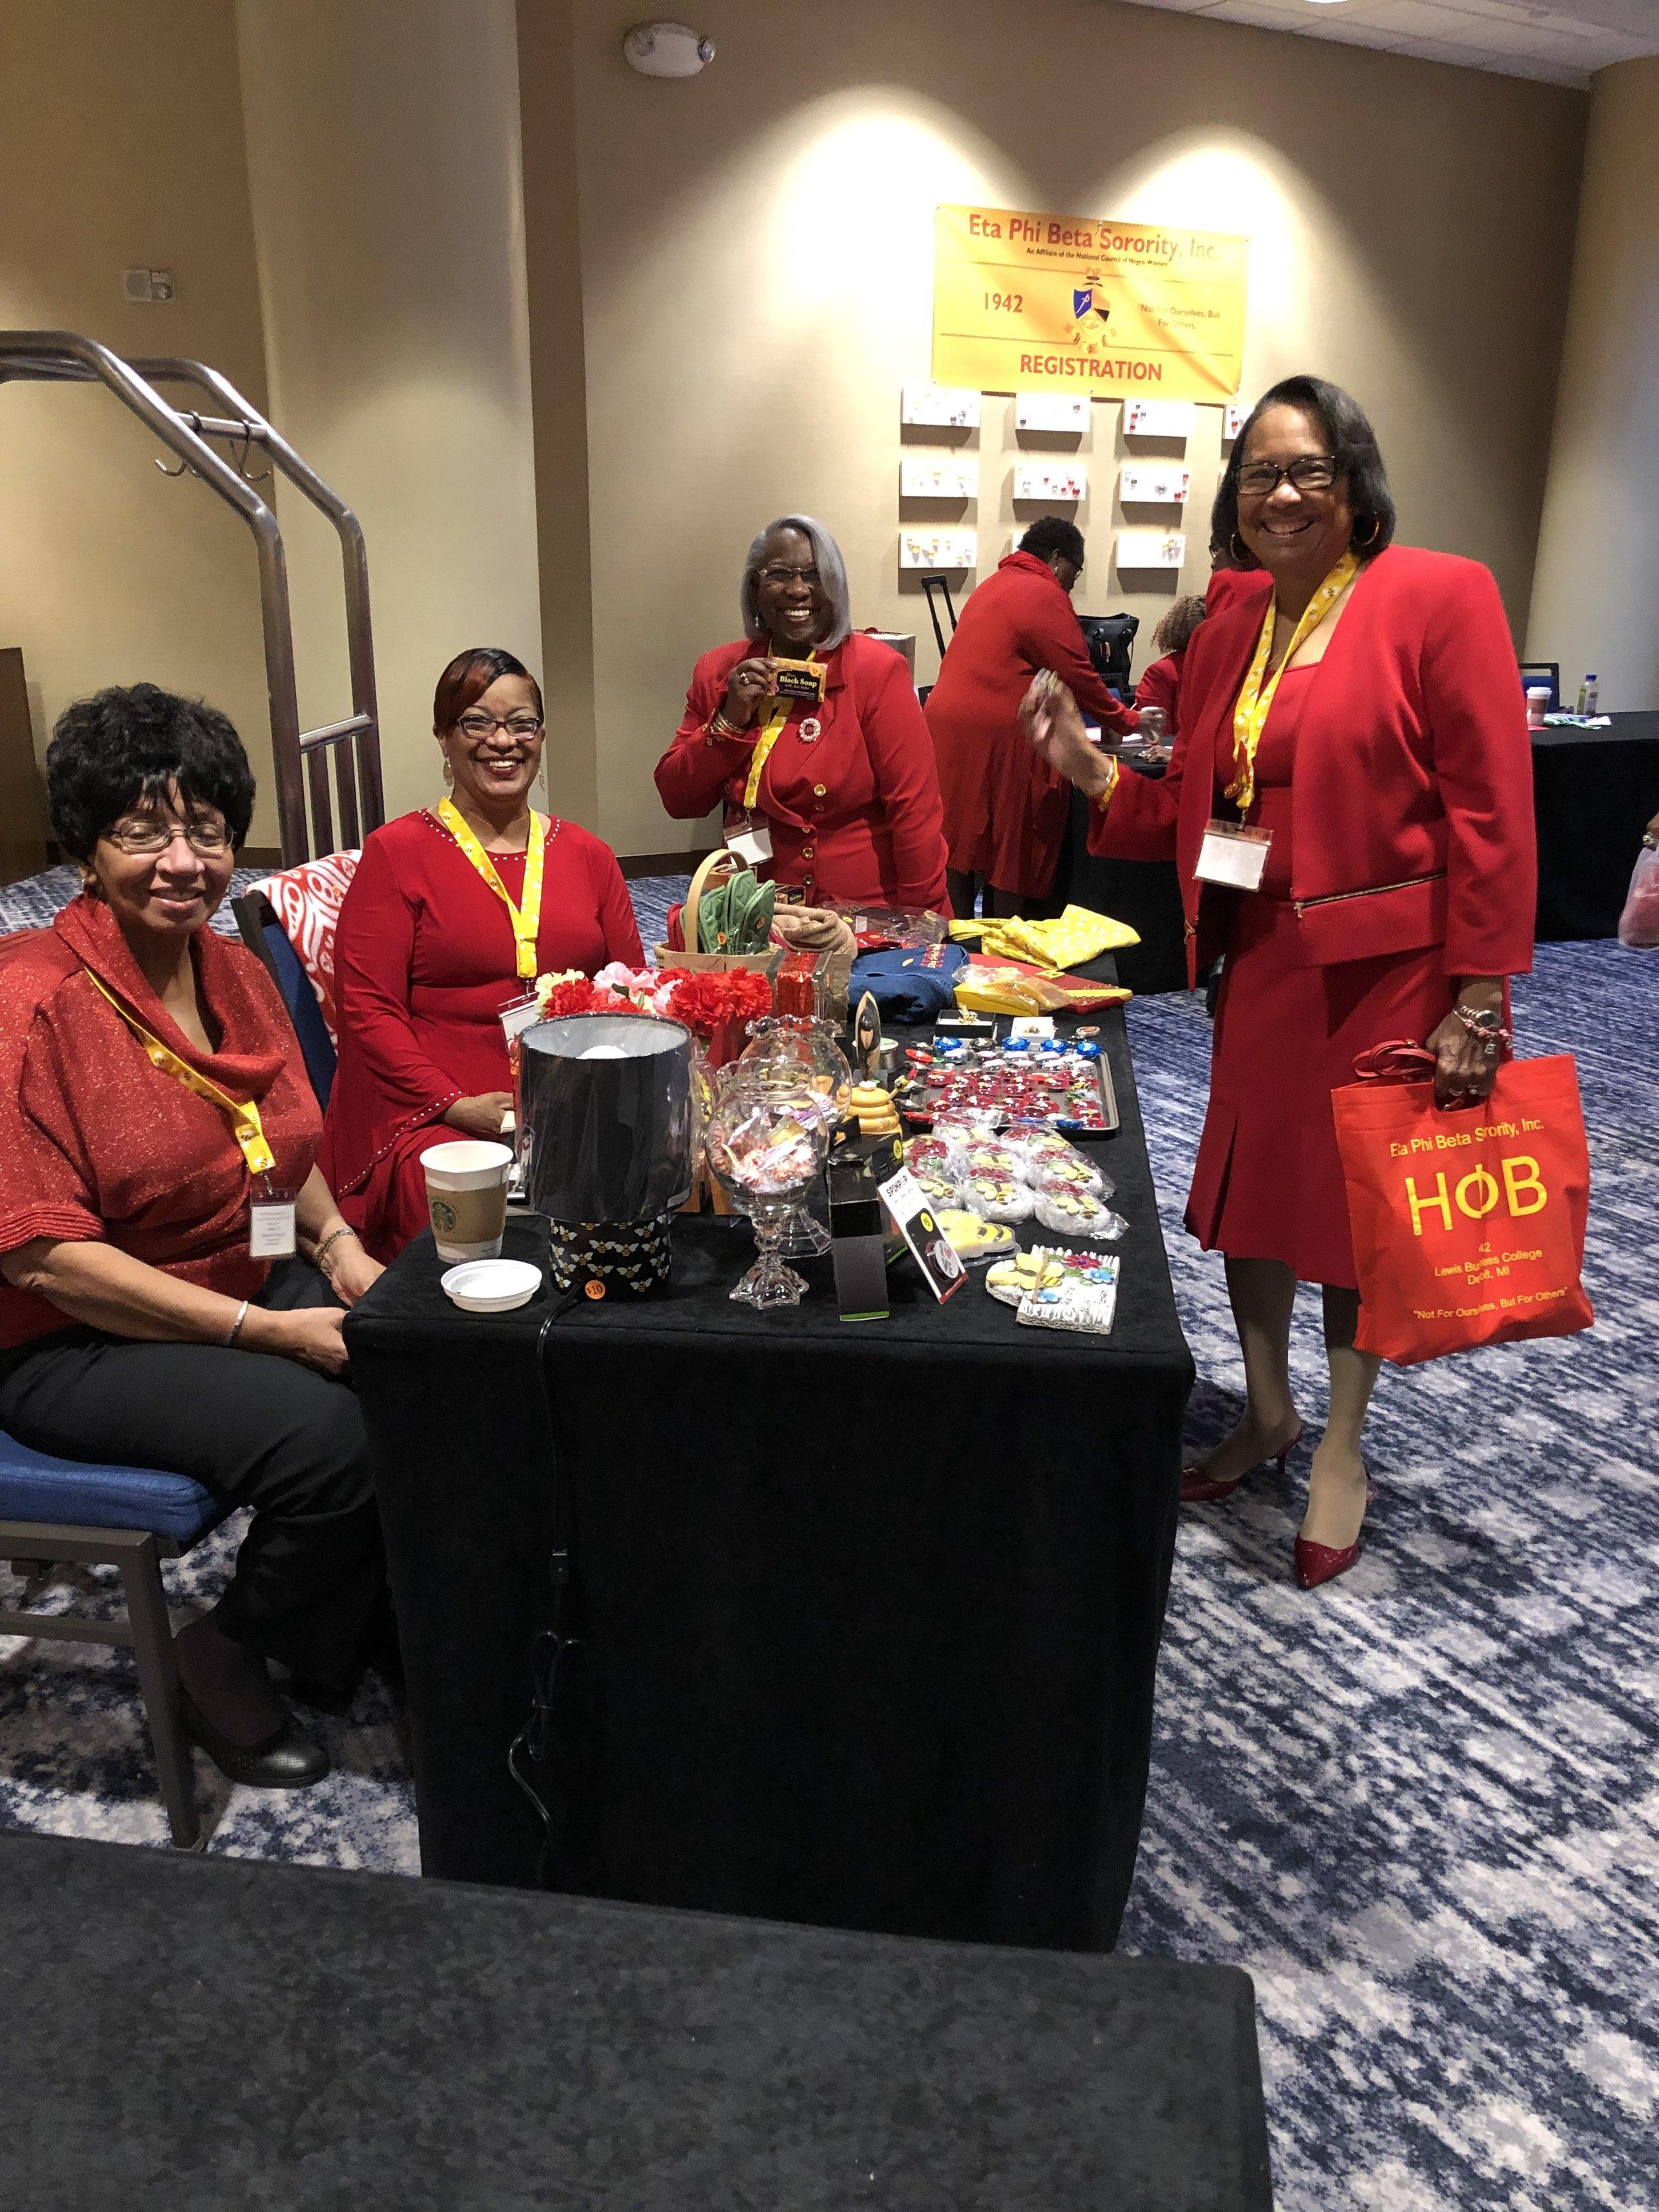 Alpha Theta's vending table at the Grand Executive Board Meeting, Arlington, VA, March 2019